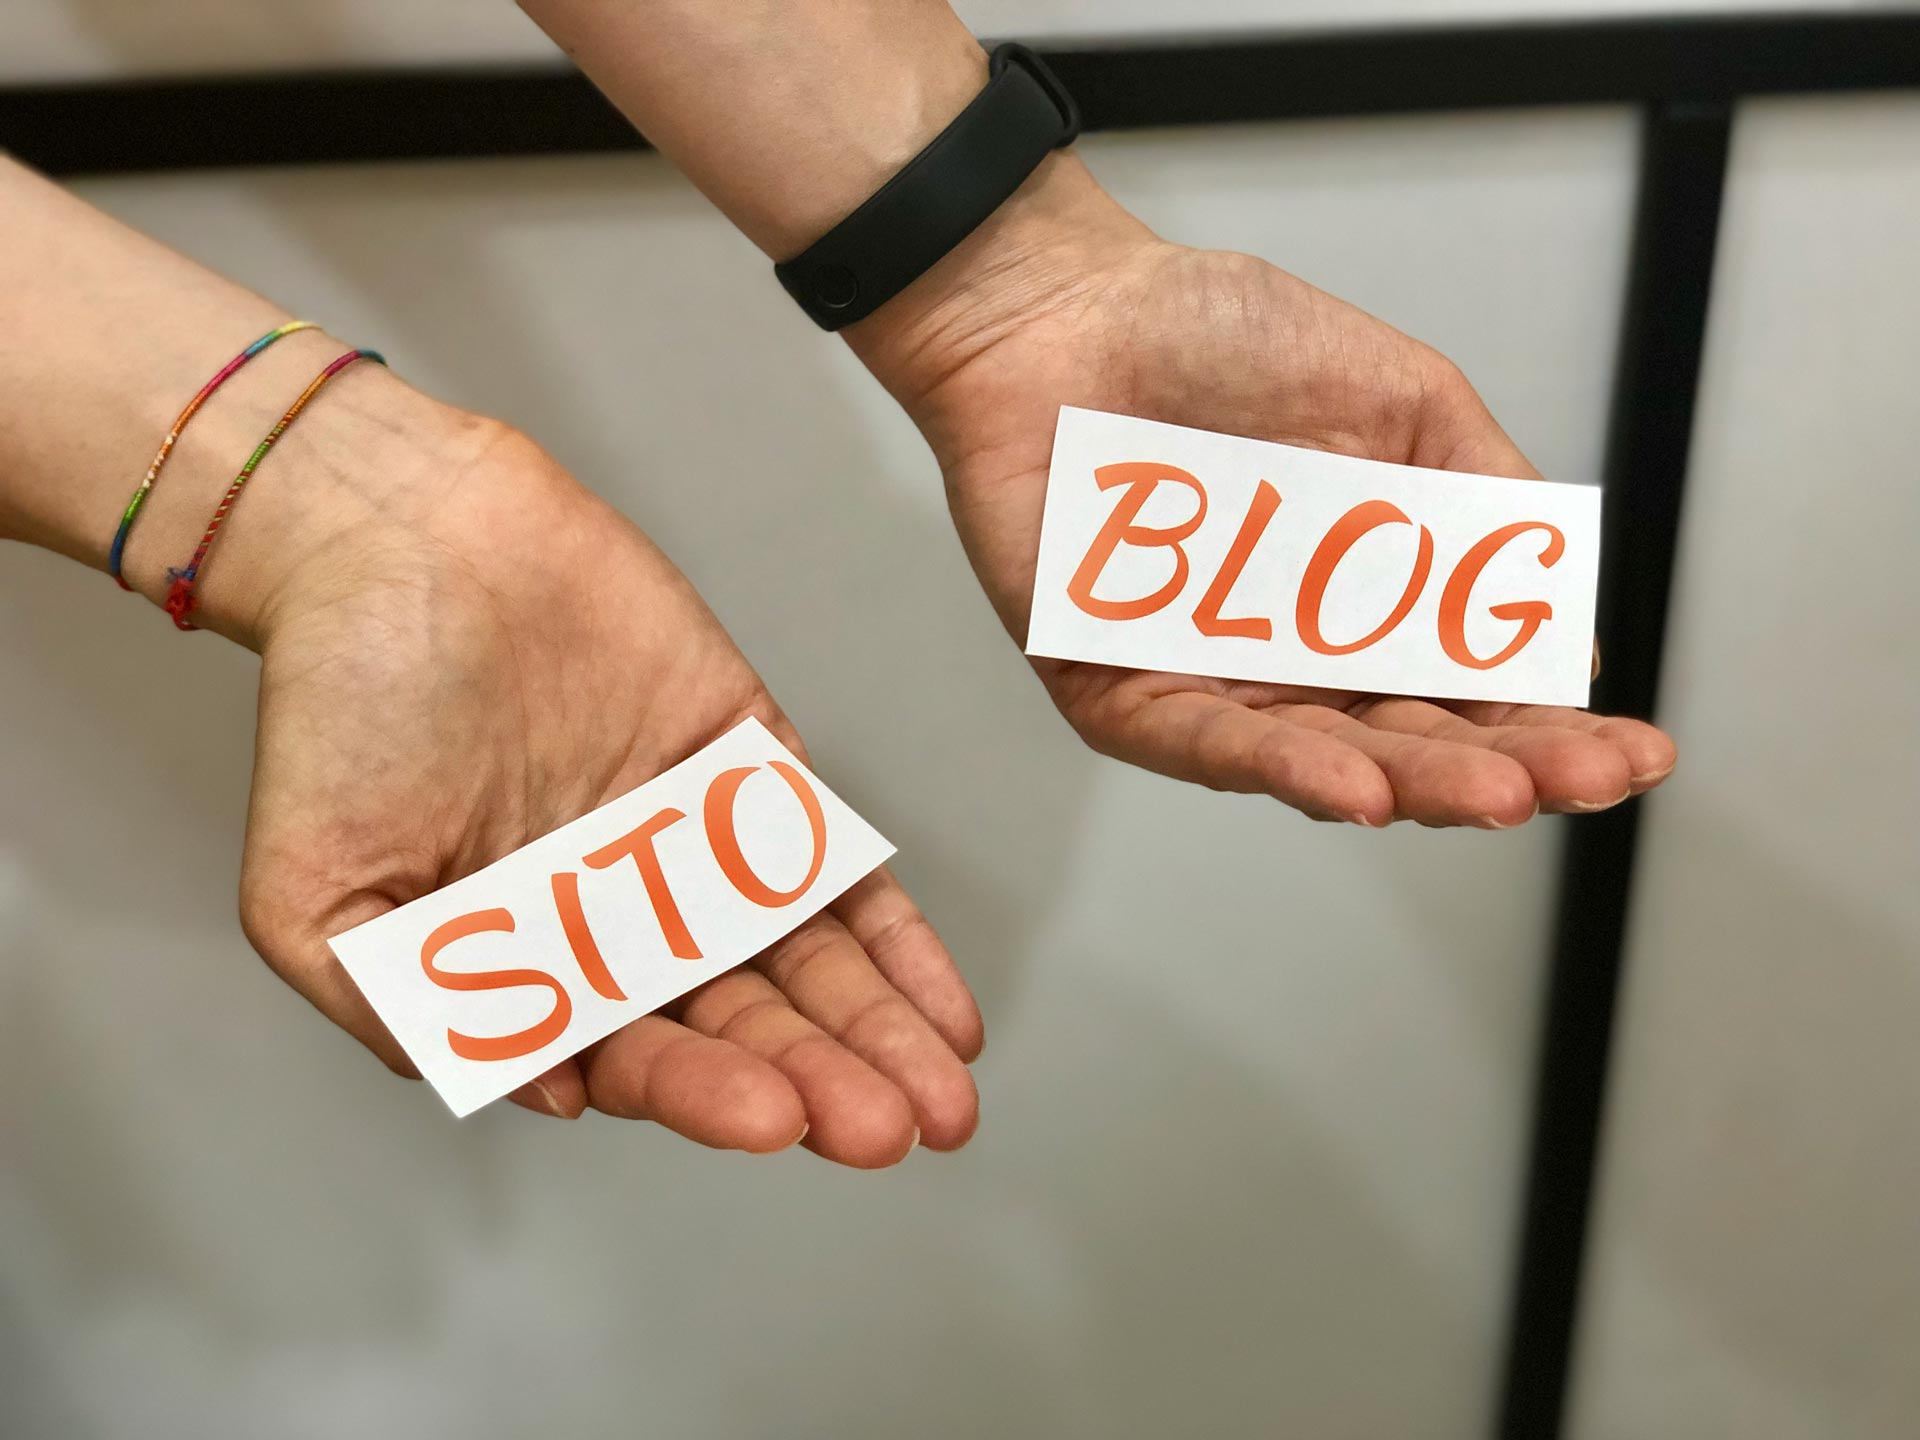 sito o blog